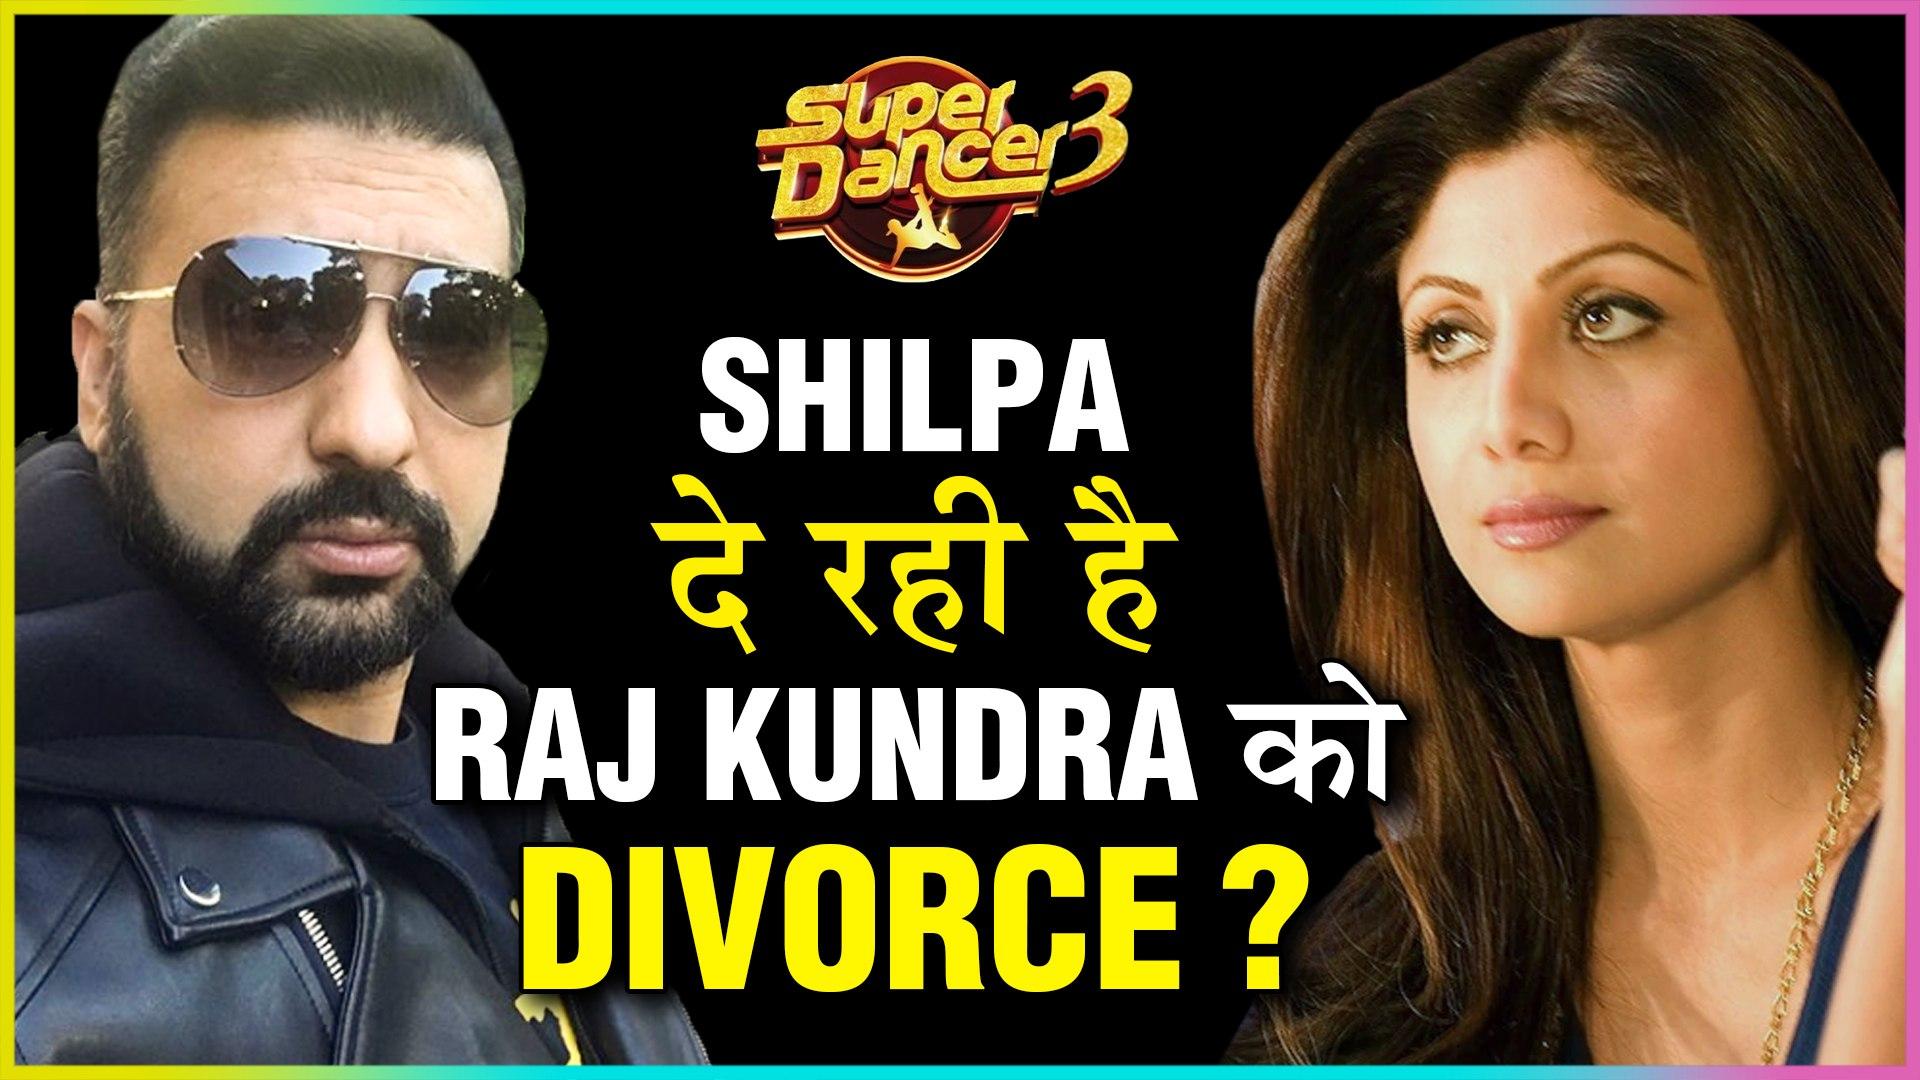 Shilpa Shetty To Take DIVORCE With Husband Raj Kundra?   Super Dancer  Chapter 3